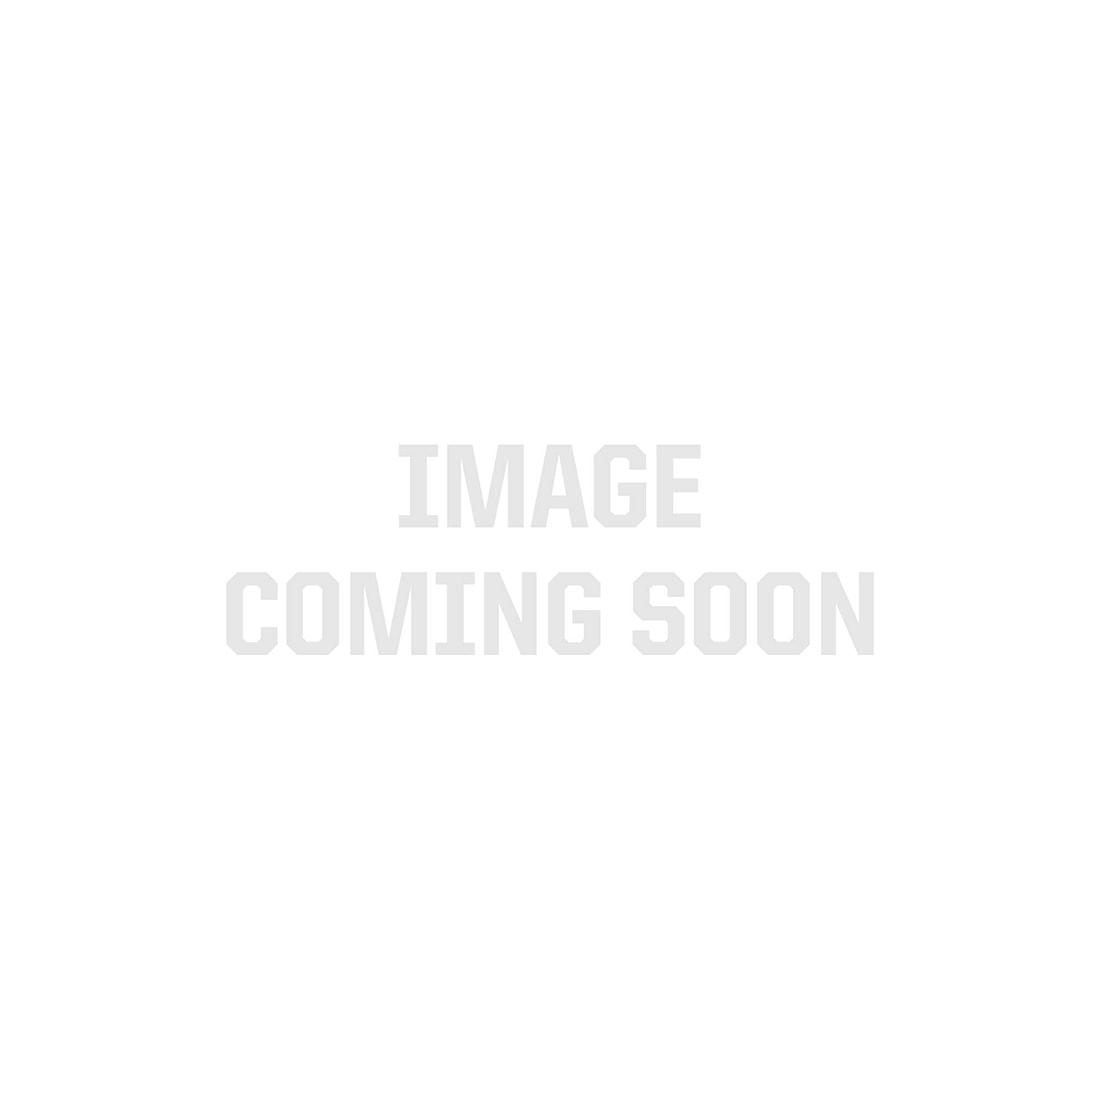 HyperFlex 2835 LED Strip Light - 1,600K Amber - 60/m - CurrentControl - Foot